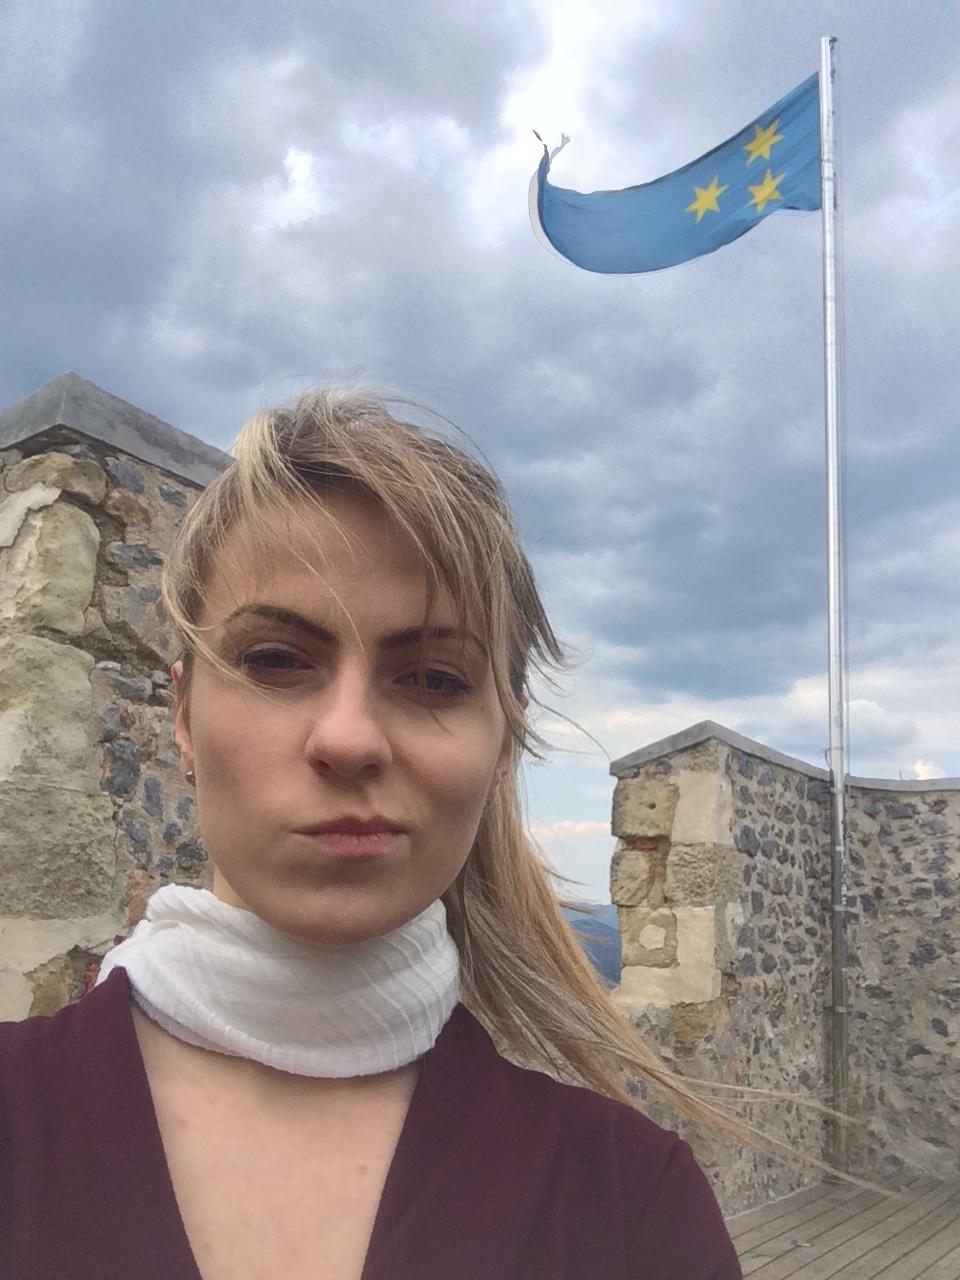 Last month of my EYE in Slovenia – Liliana Wiadrowska